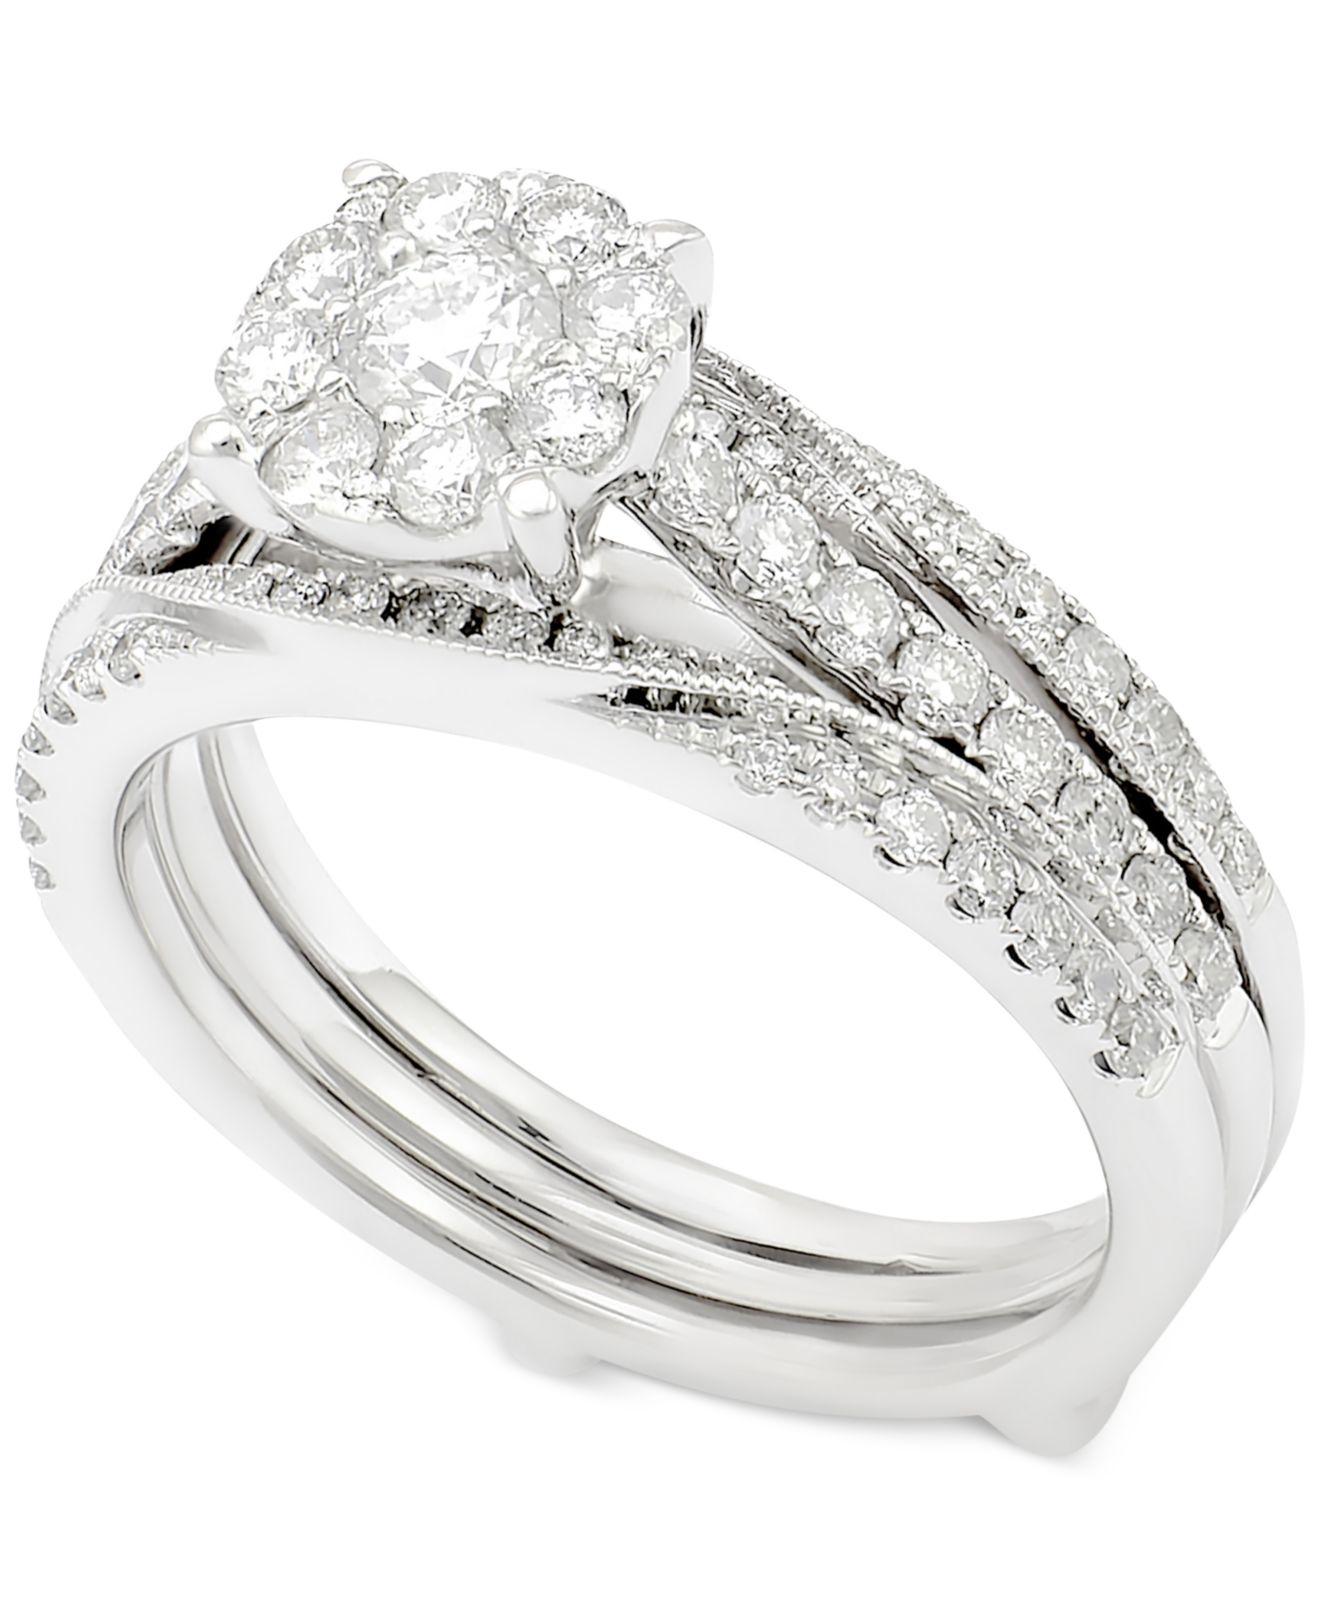 Macy s Diamond Cluster Three piece Bridal Set 1 Ct T w In 14k White Go